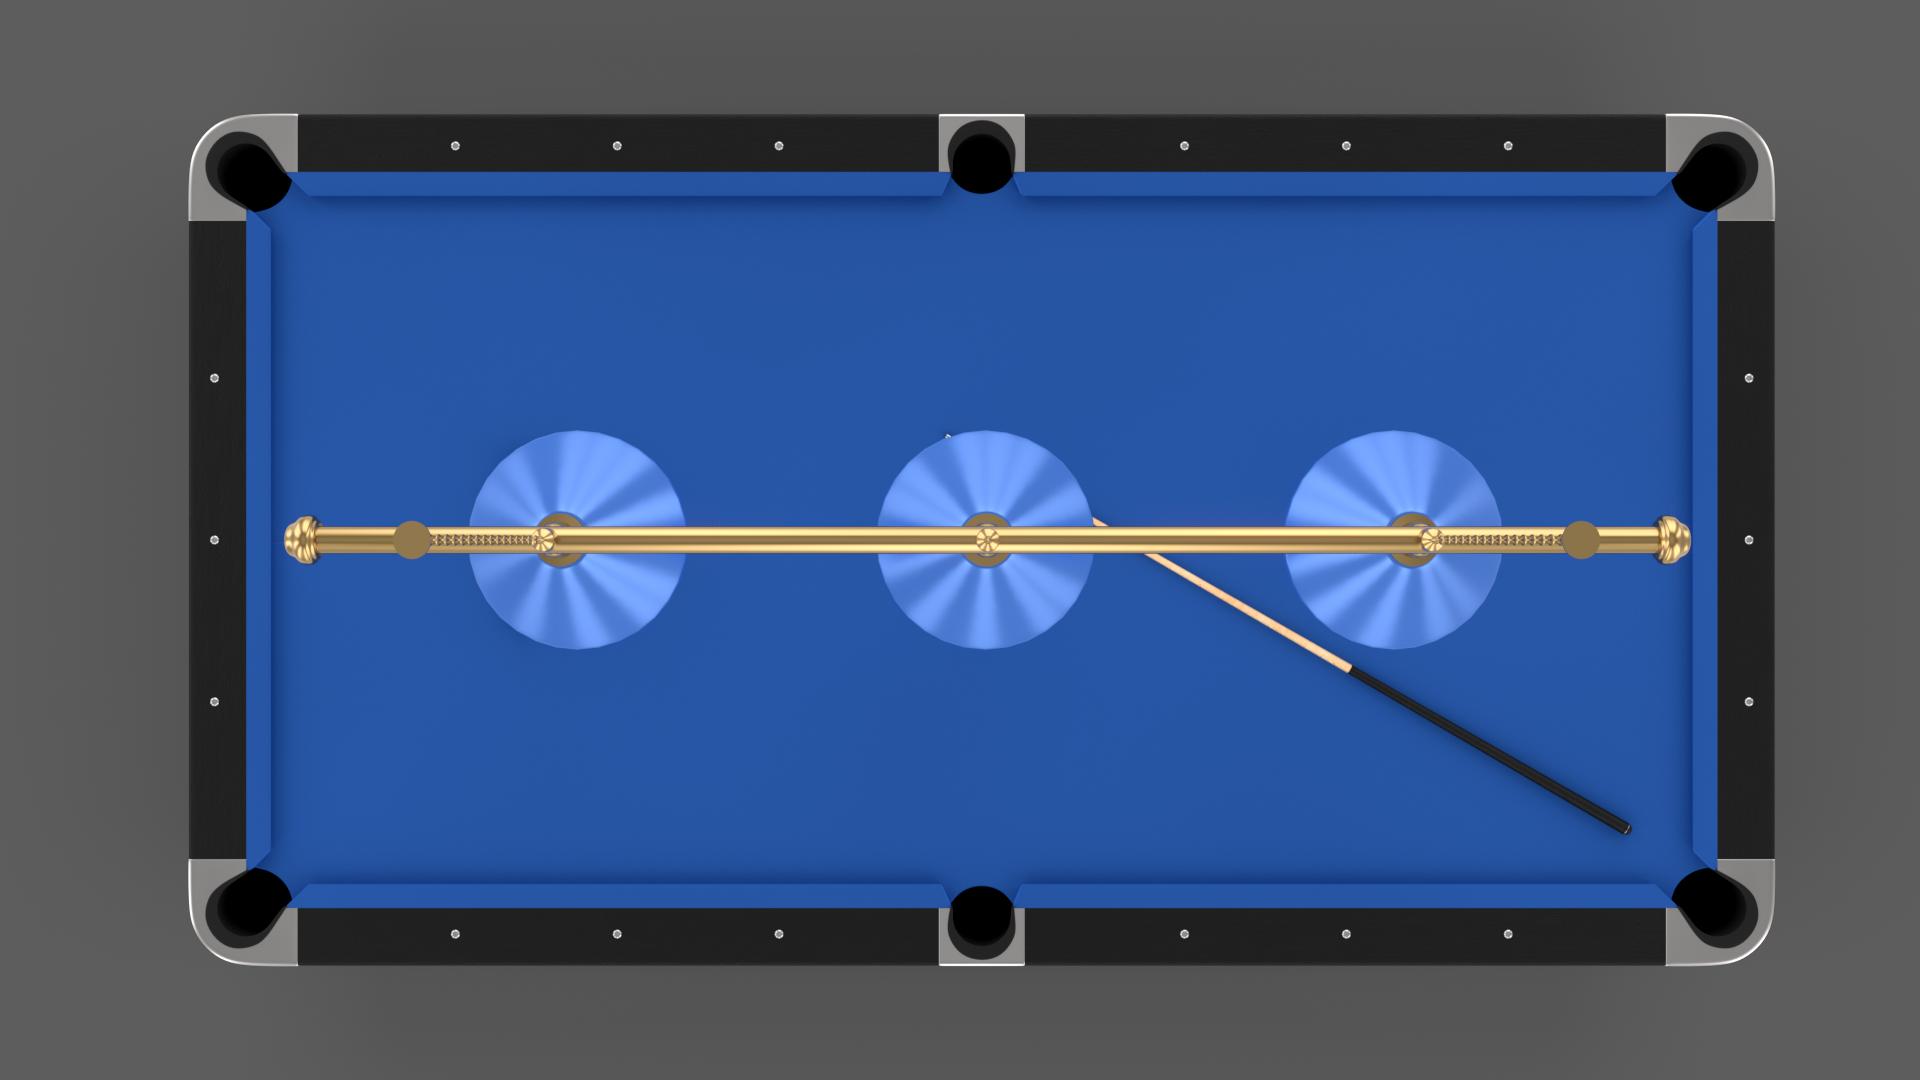 8 Ball Pool Table Setting Blue Pool Table Pool Balls Table Settings